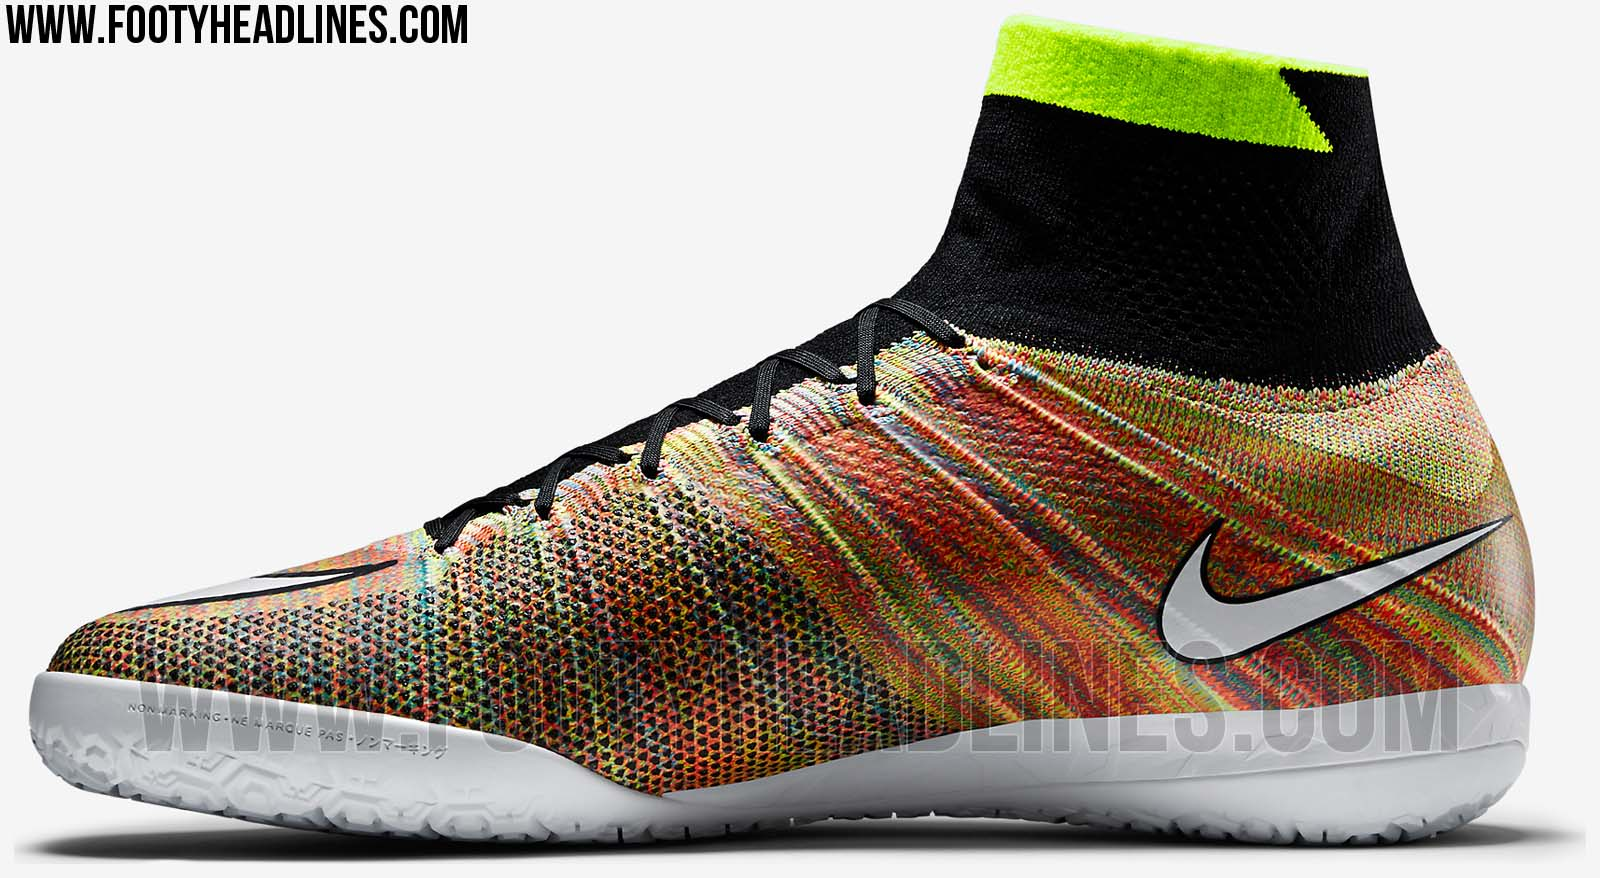 Nike Mercurial X Multicolor Boots Released - Footy Headlines